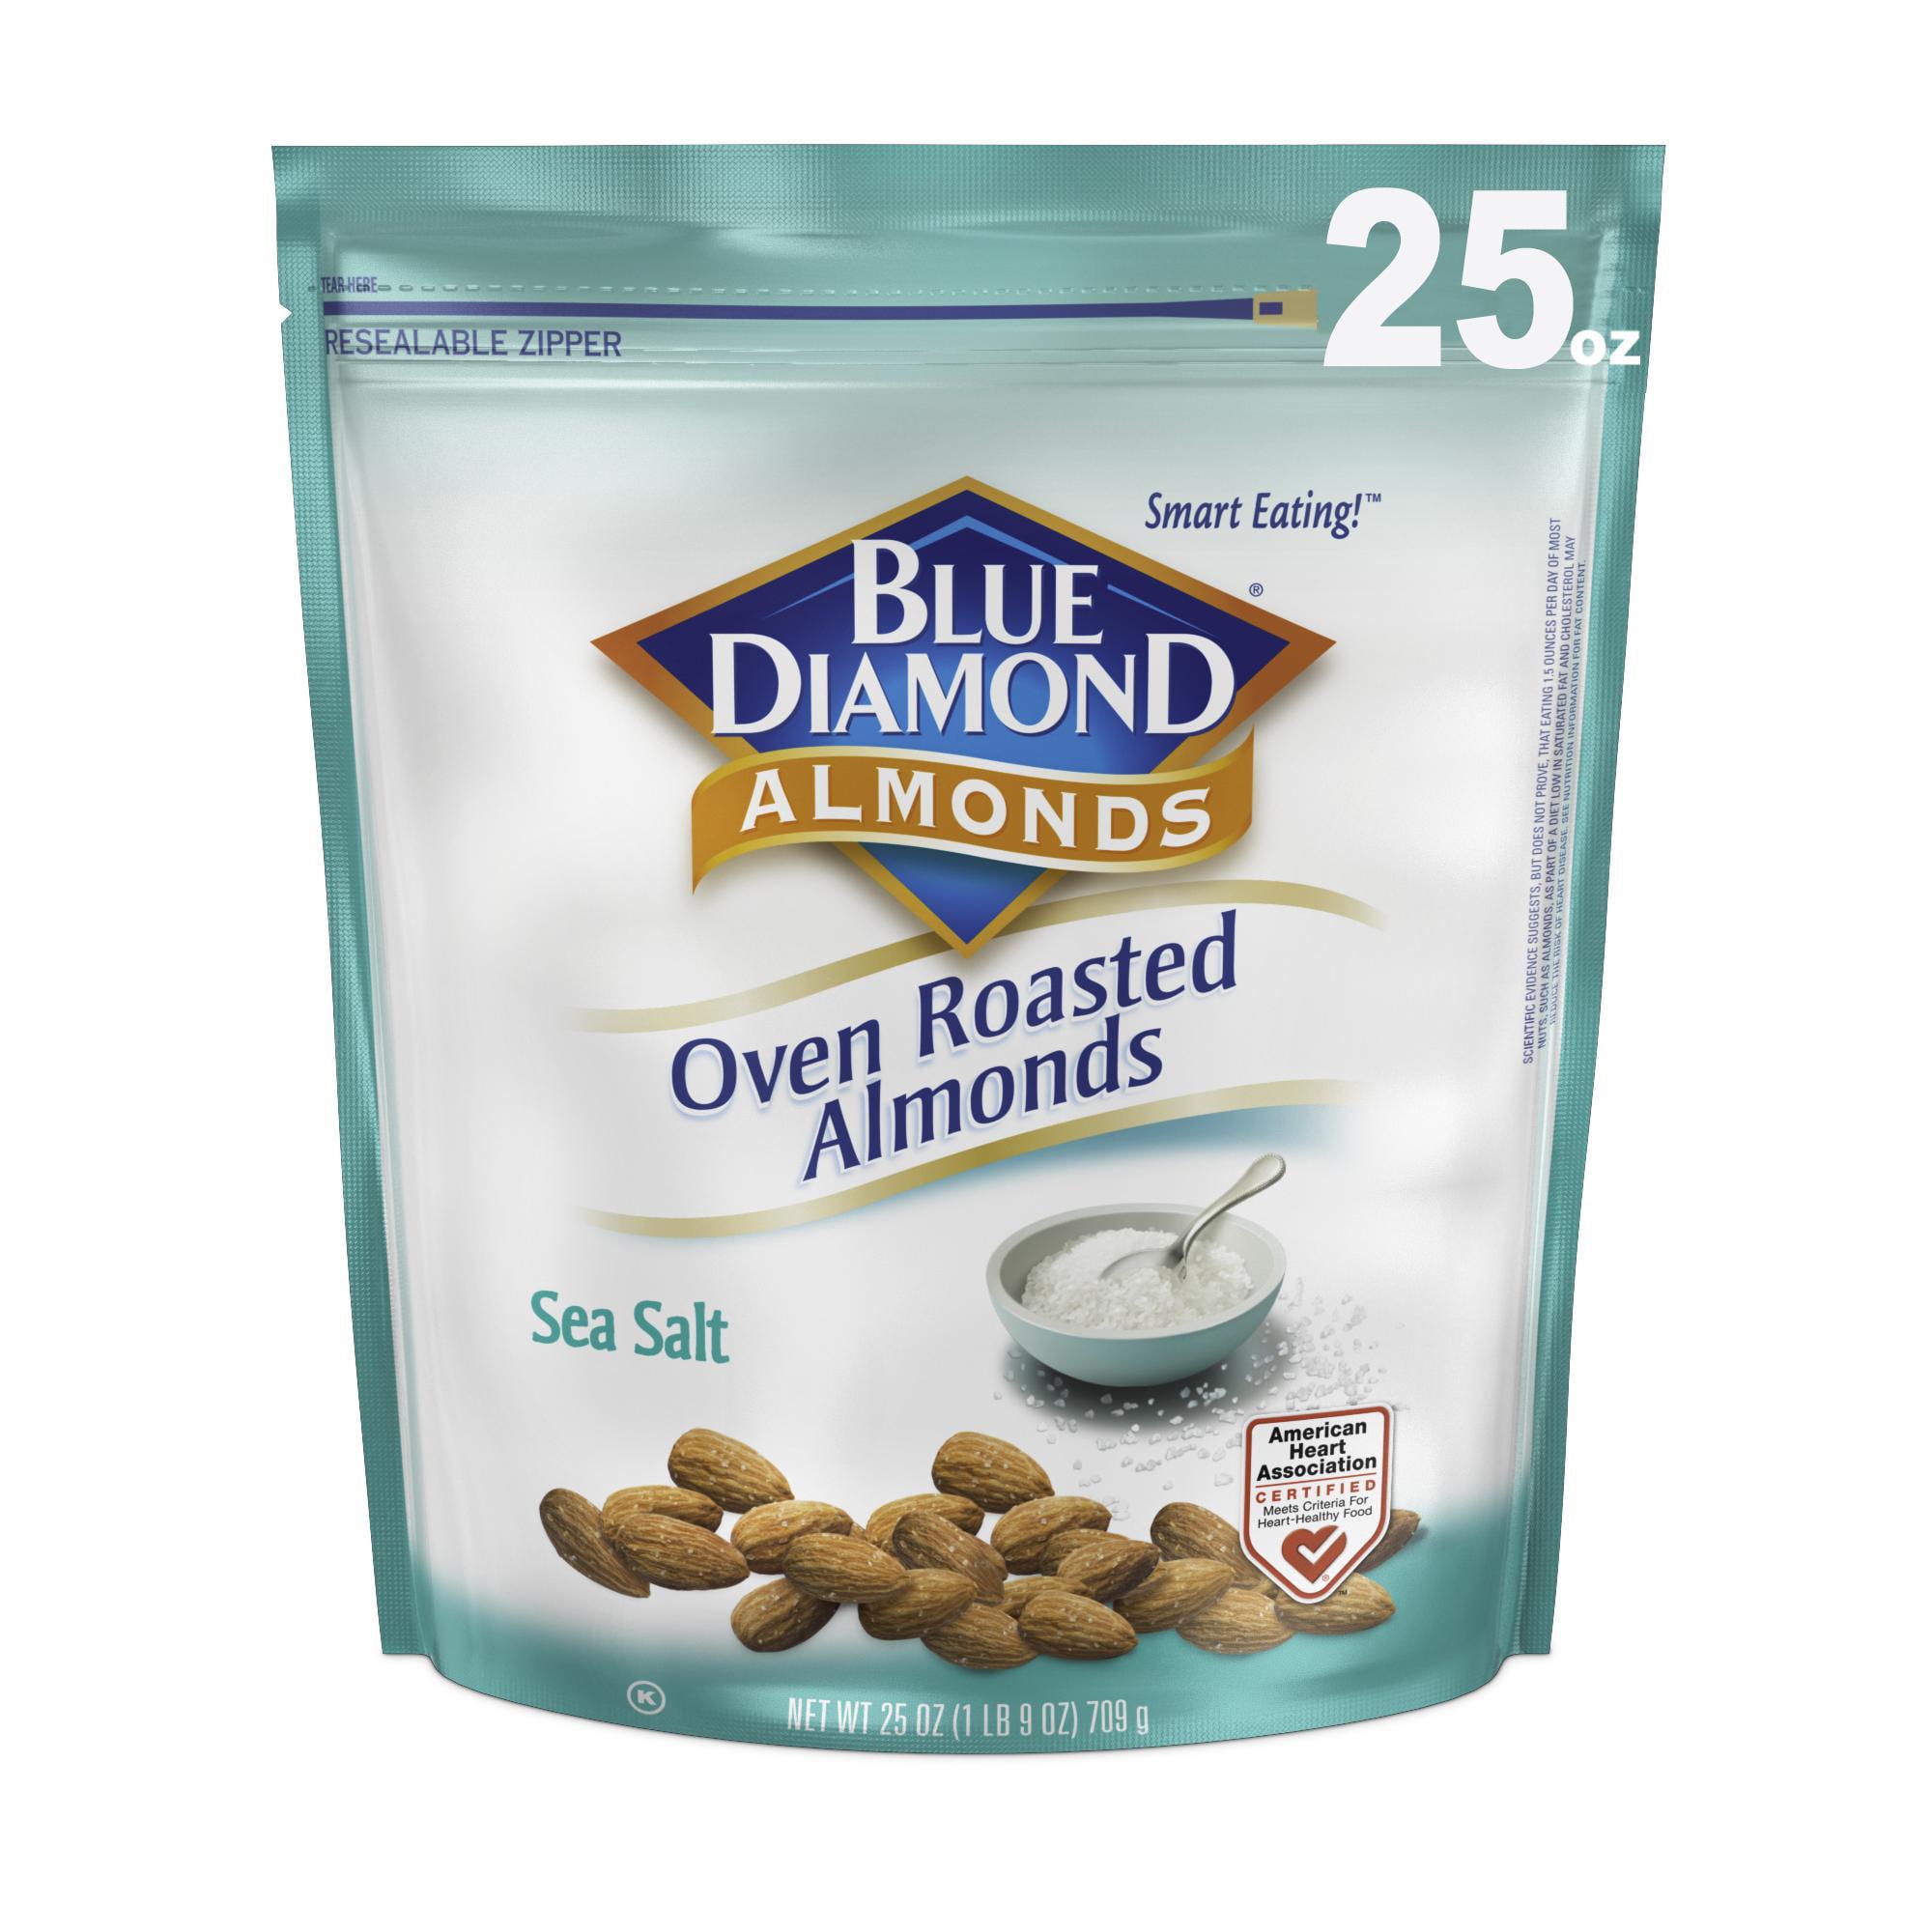 Blue Diamond Almonds, Oven Roasted Sea Salt 25 oz